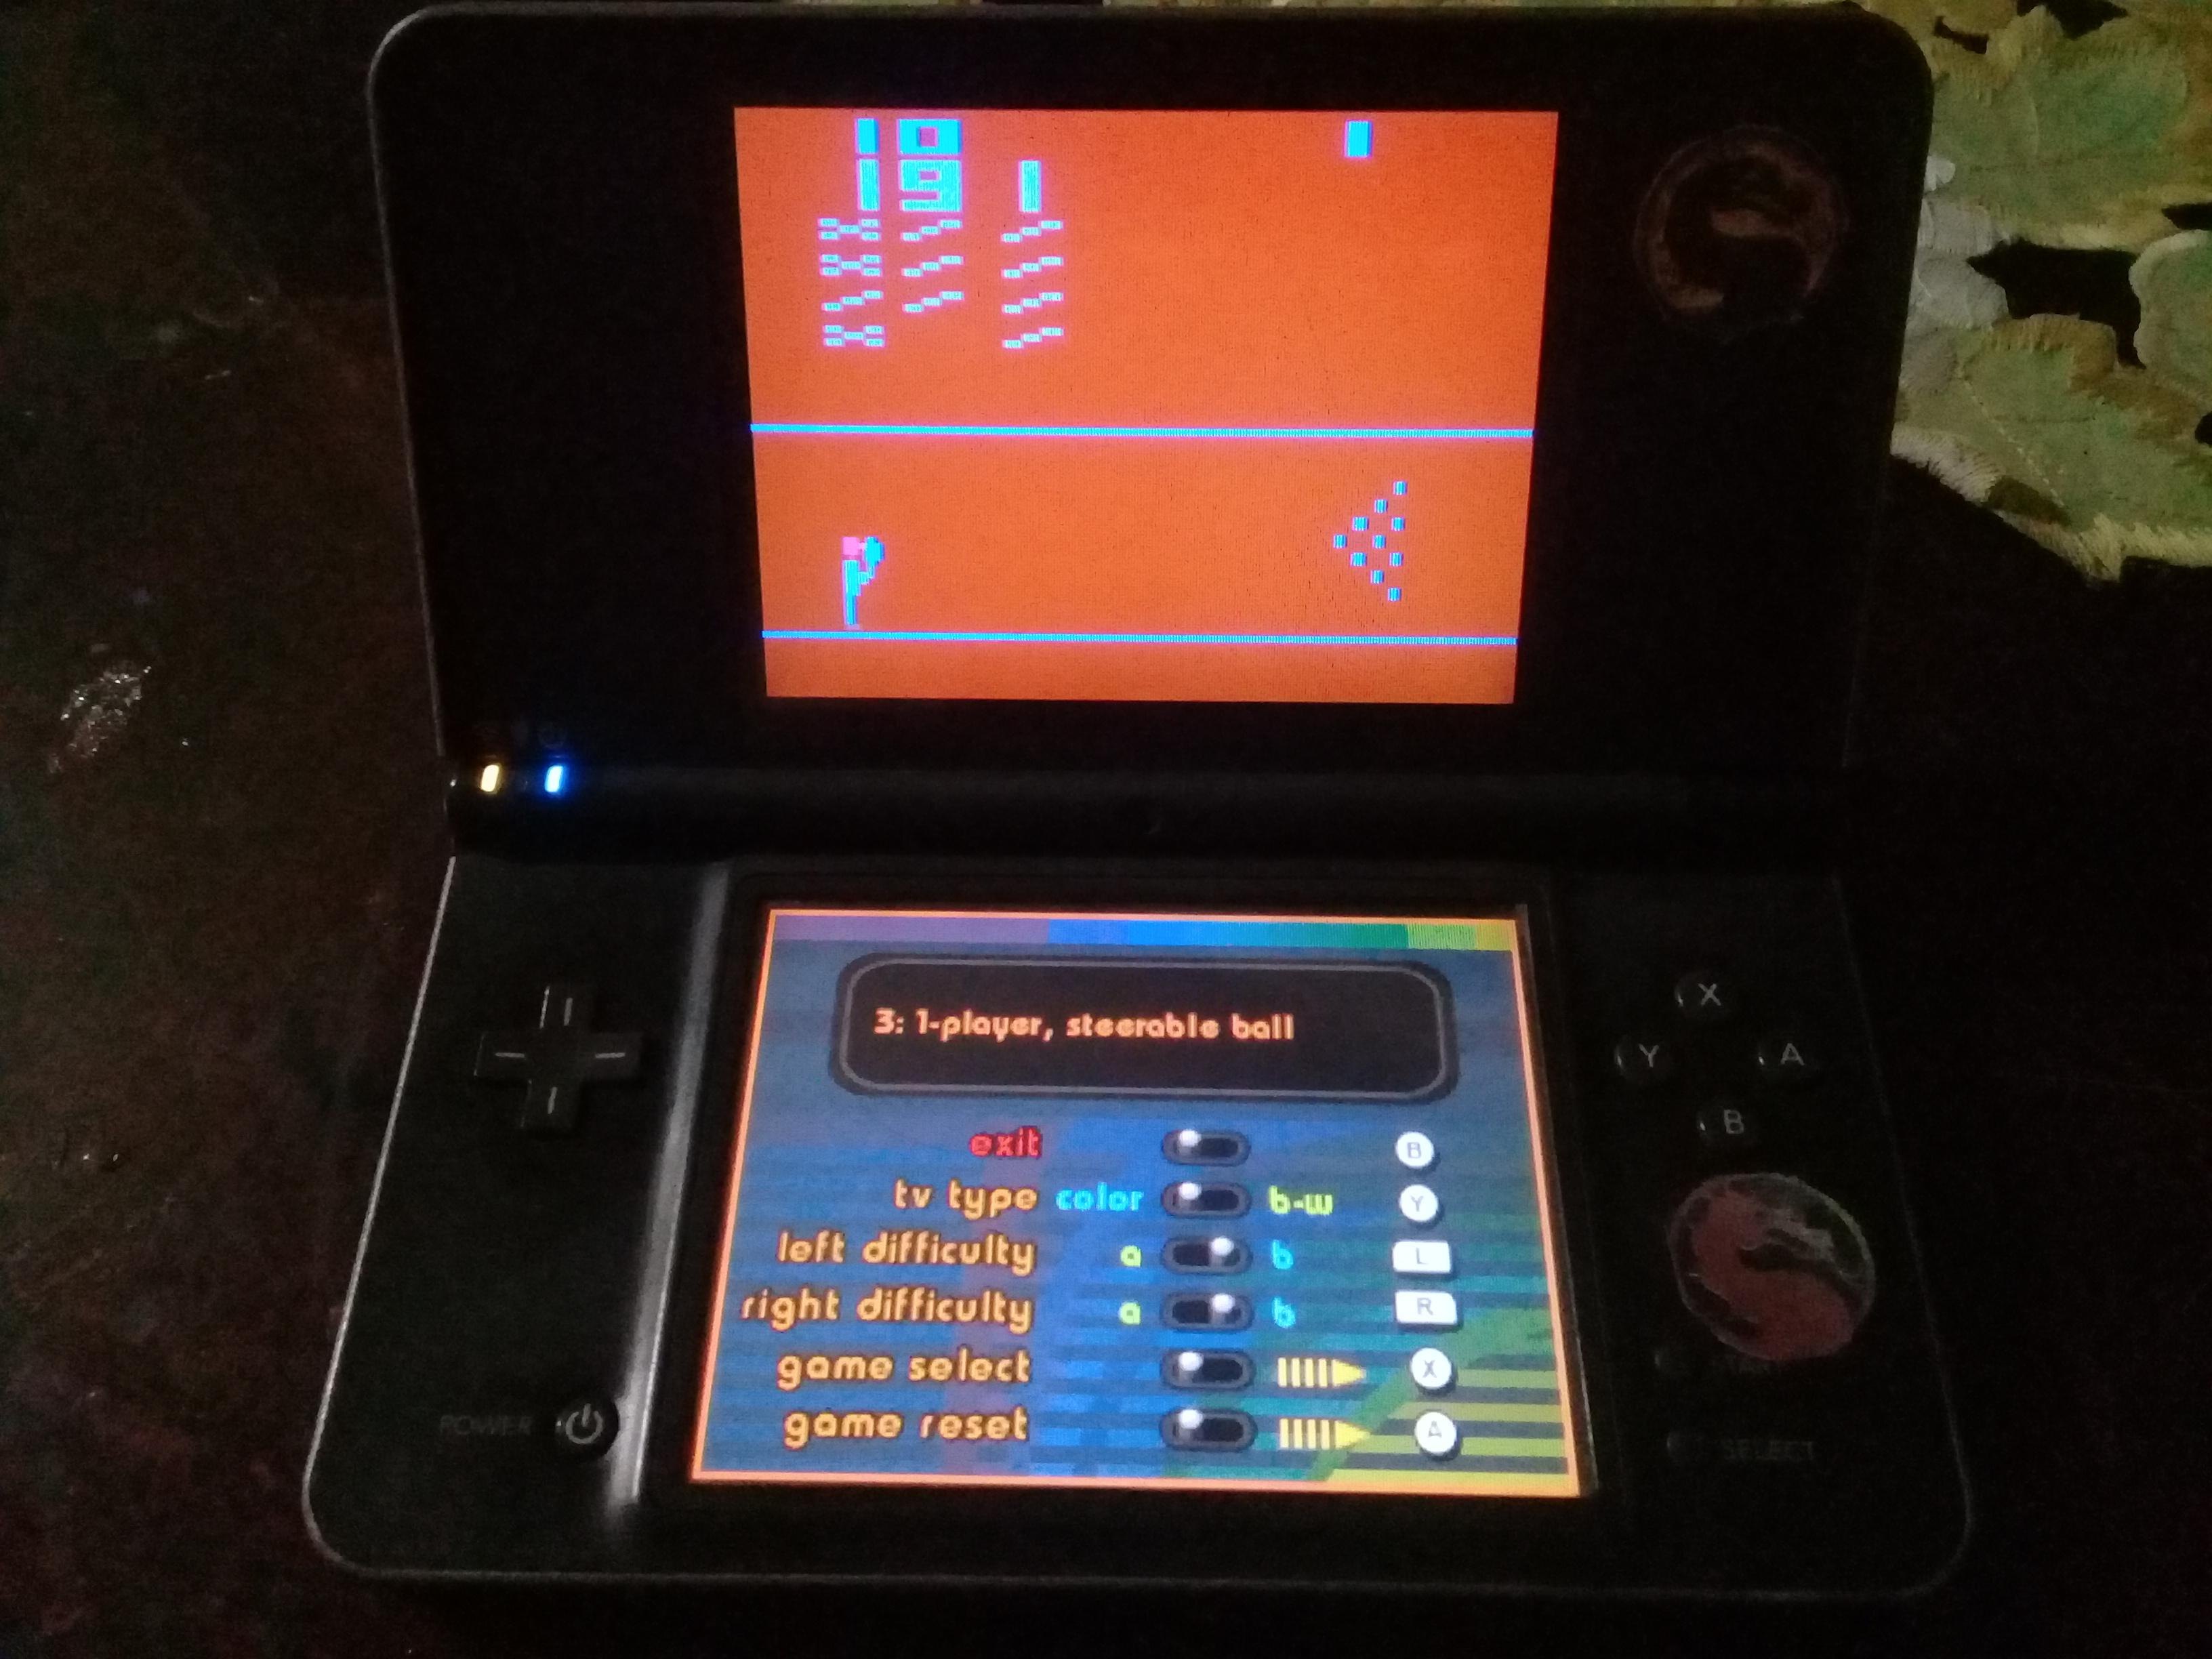 omargeddon: Atari Greatest Hits: Volume 1: Bowling: Game 3 [Atari 2600] (Nintendo DS) 191 points on 2021-10-01 00:34:41